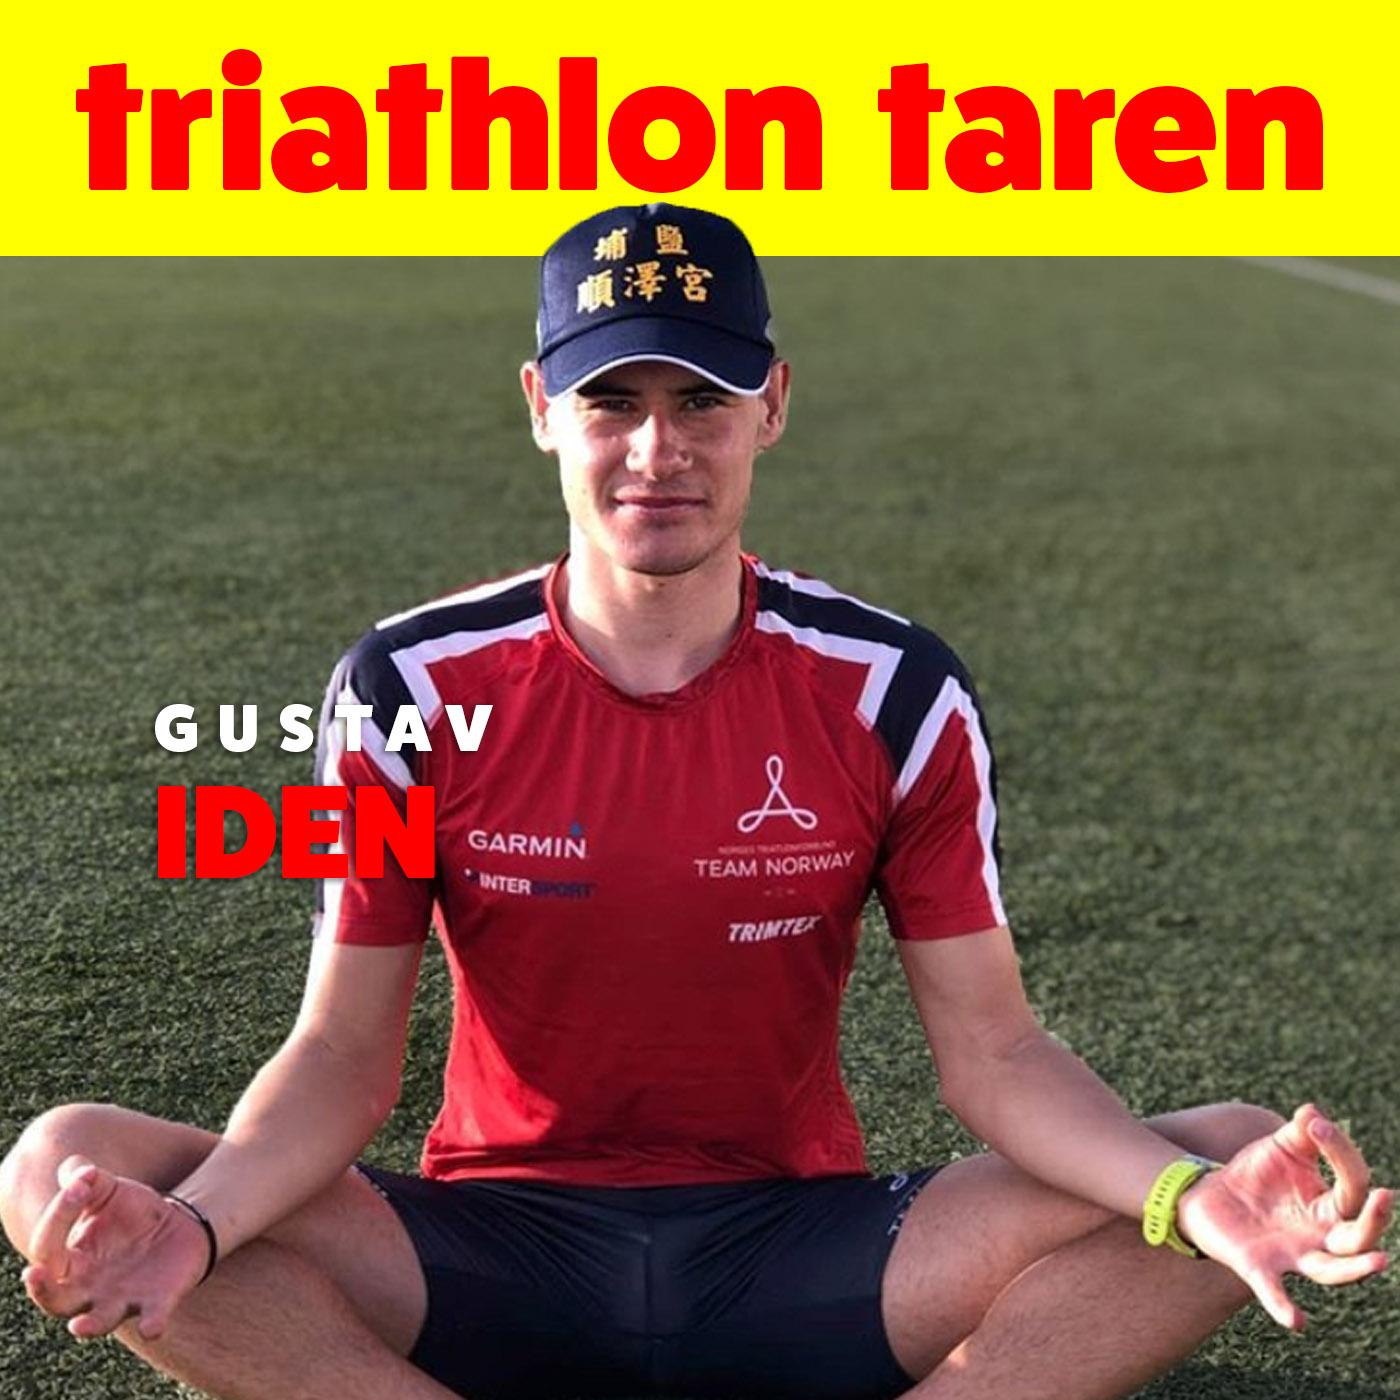 2019 70.3 World Champion Gustav Iden: Lost Nutrition, Borrowed Wheels, Taiwan Hats